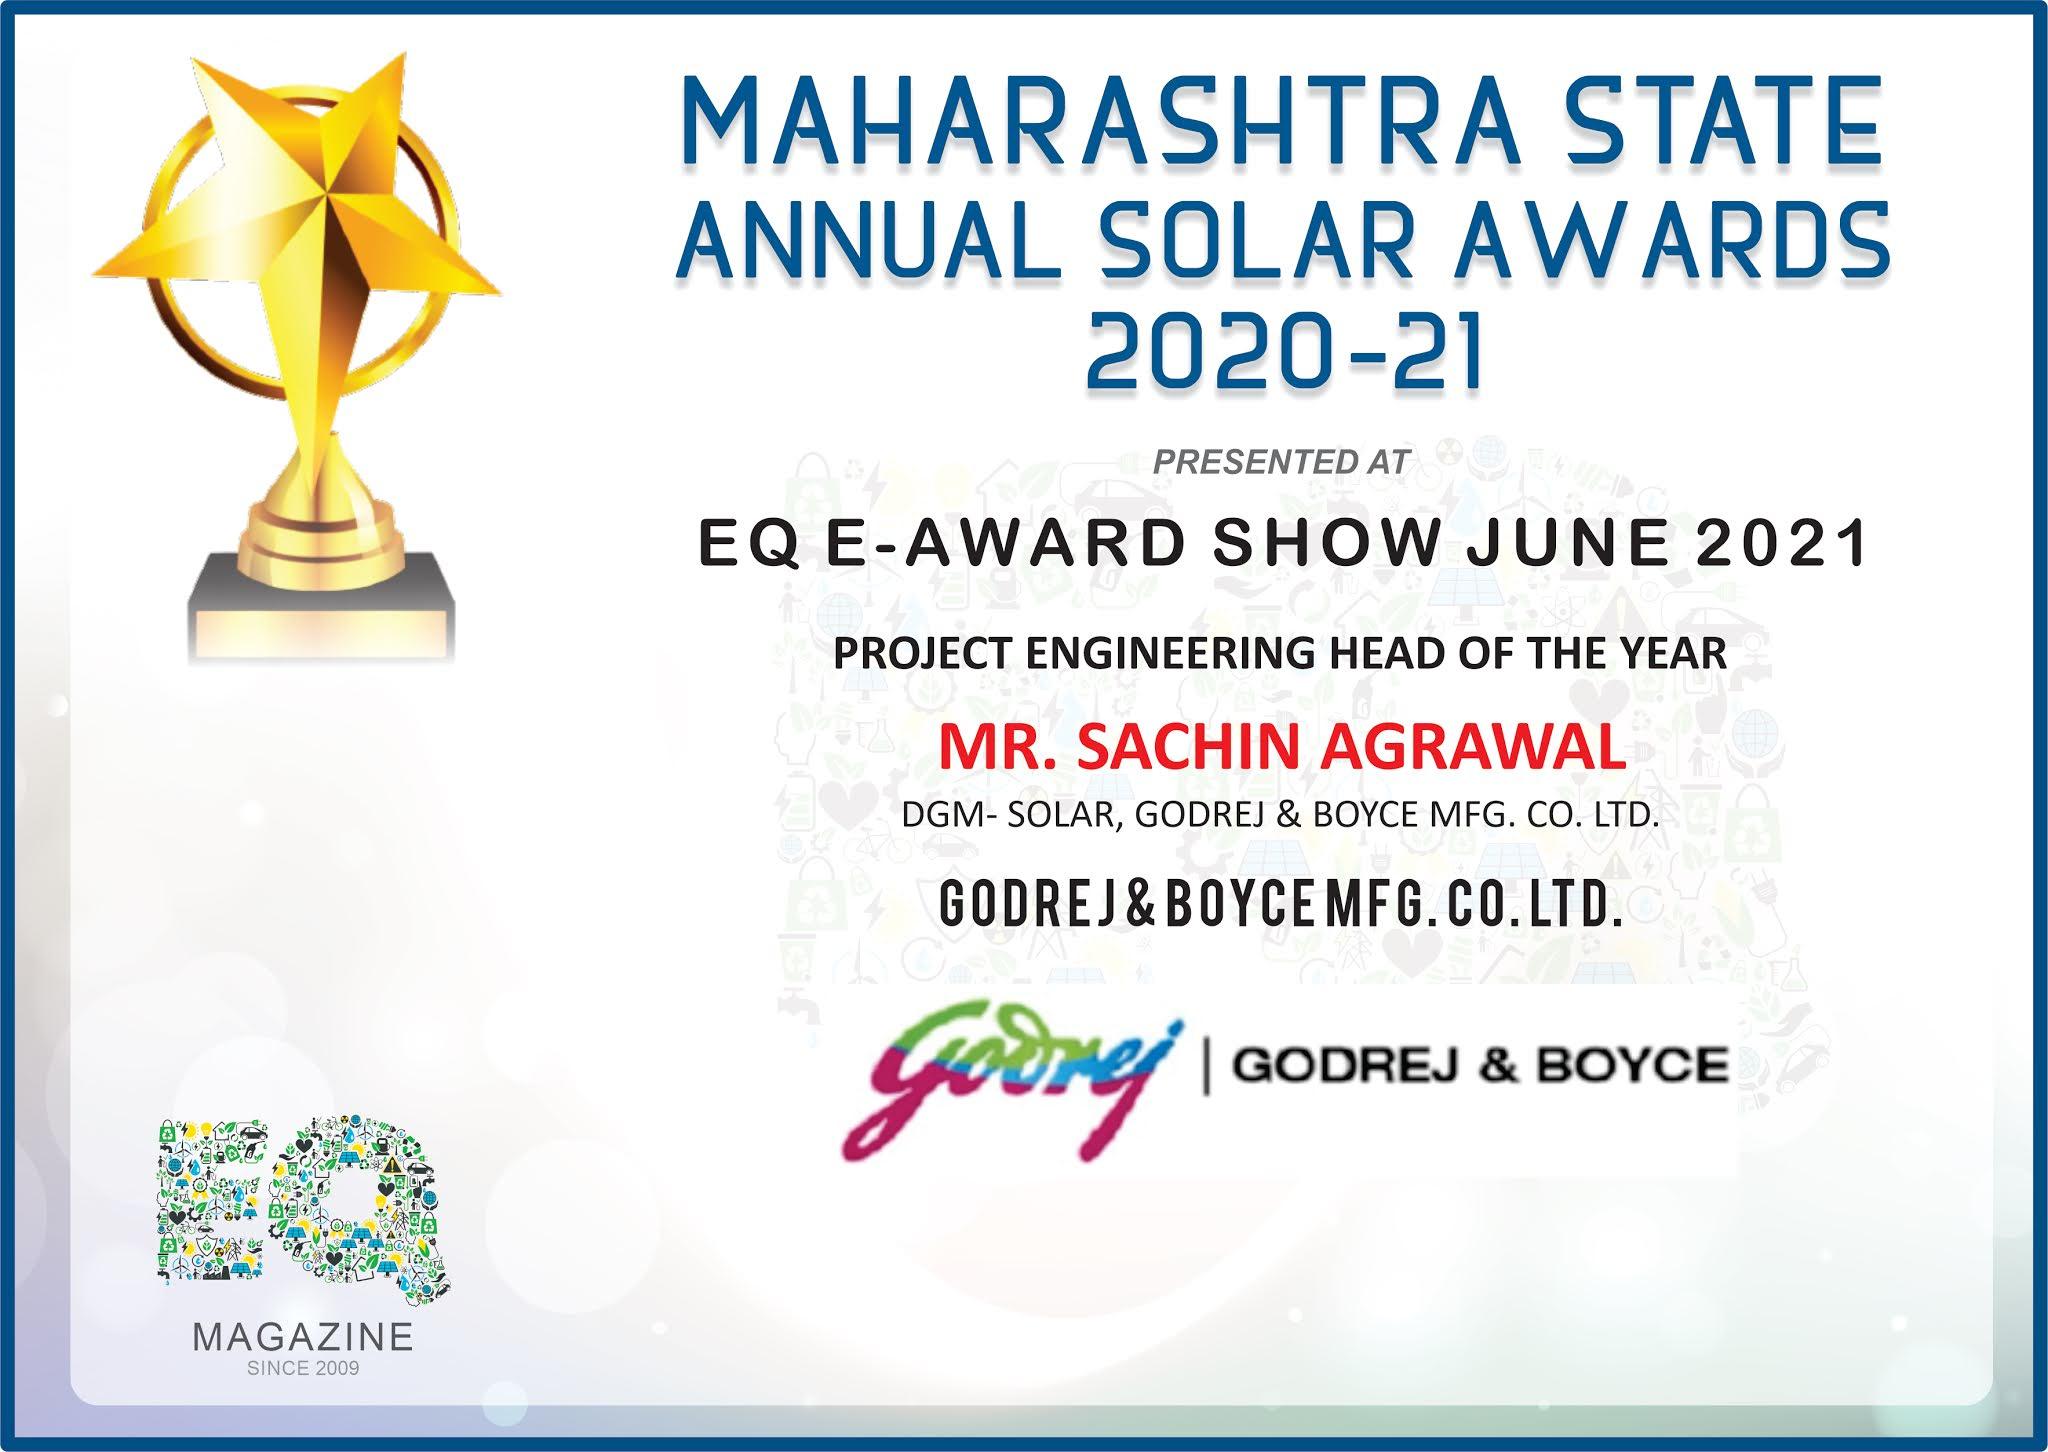 Sachin Agarwal Wins Solar Award-'Project Engineering Head of the Year'